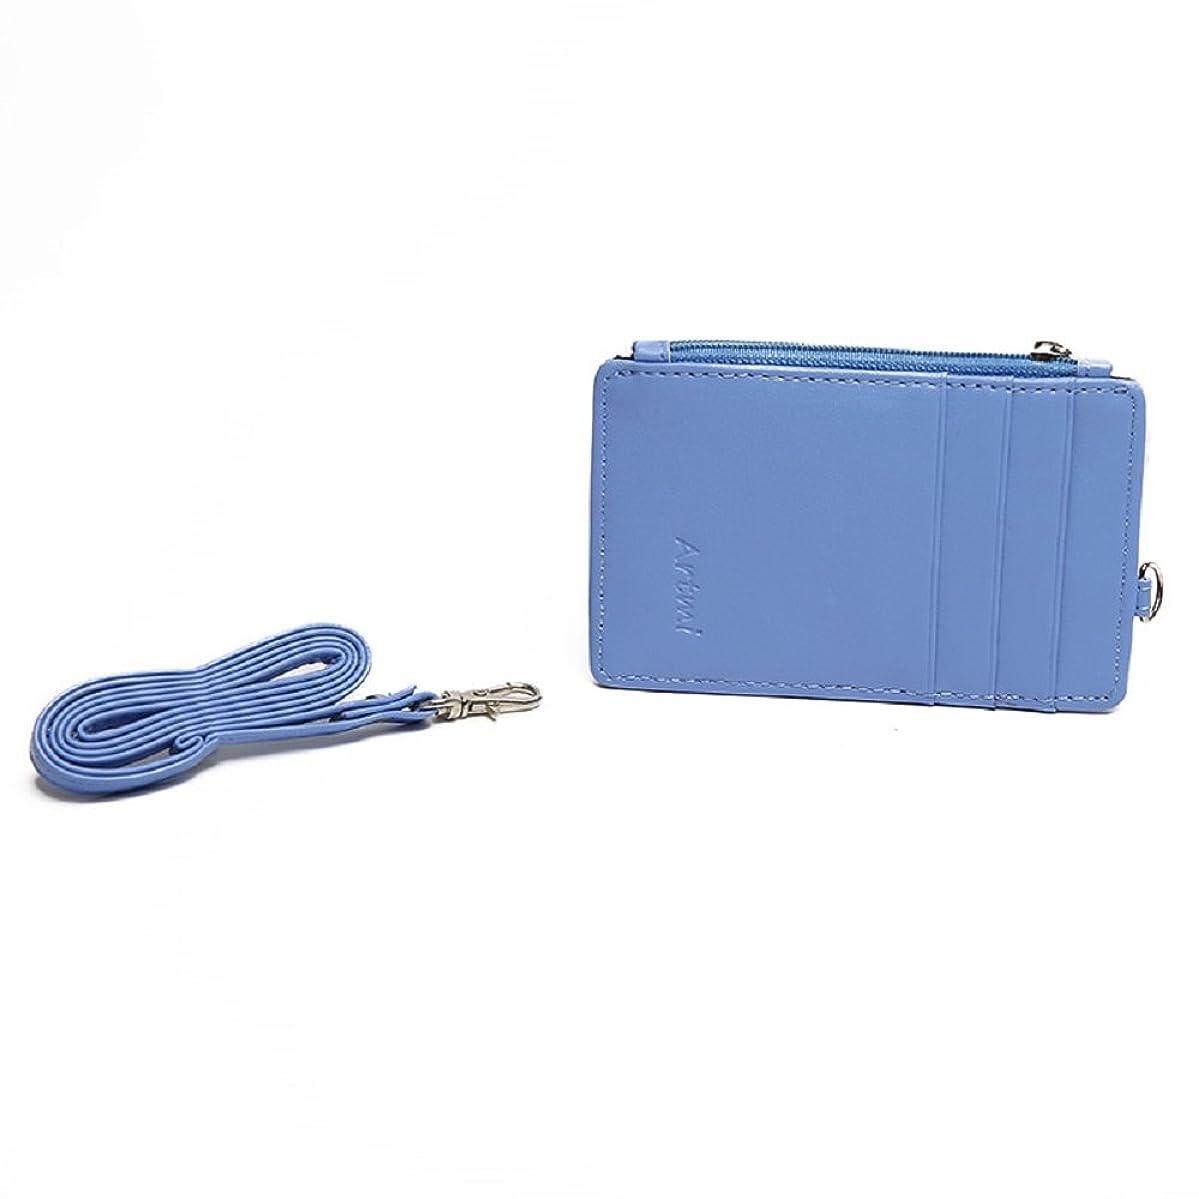 Artmi Womens RFID Blocking Card Holder Id lanyard Staff ID Card Holder Name Card Case With Neck Strap